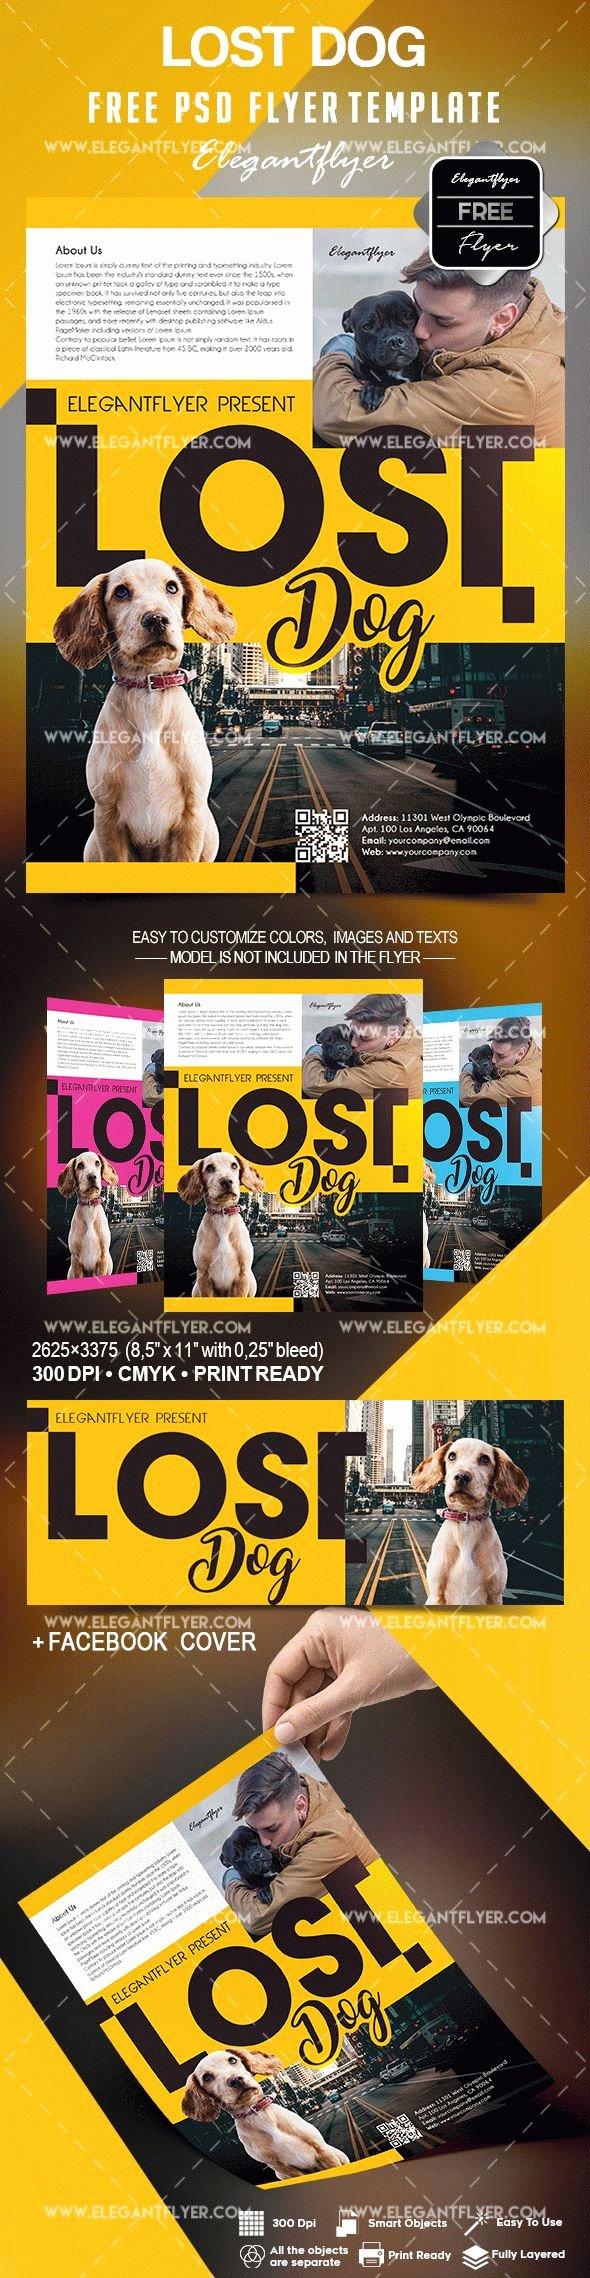 Free Lost Dog Flyer Template – by Elegantflyer